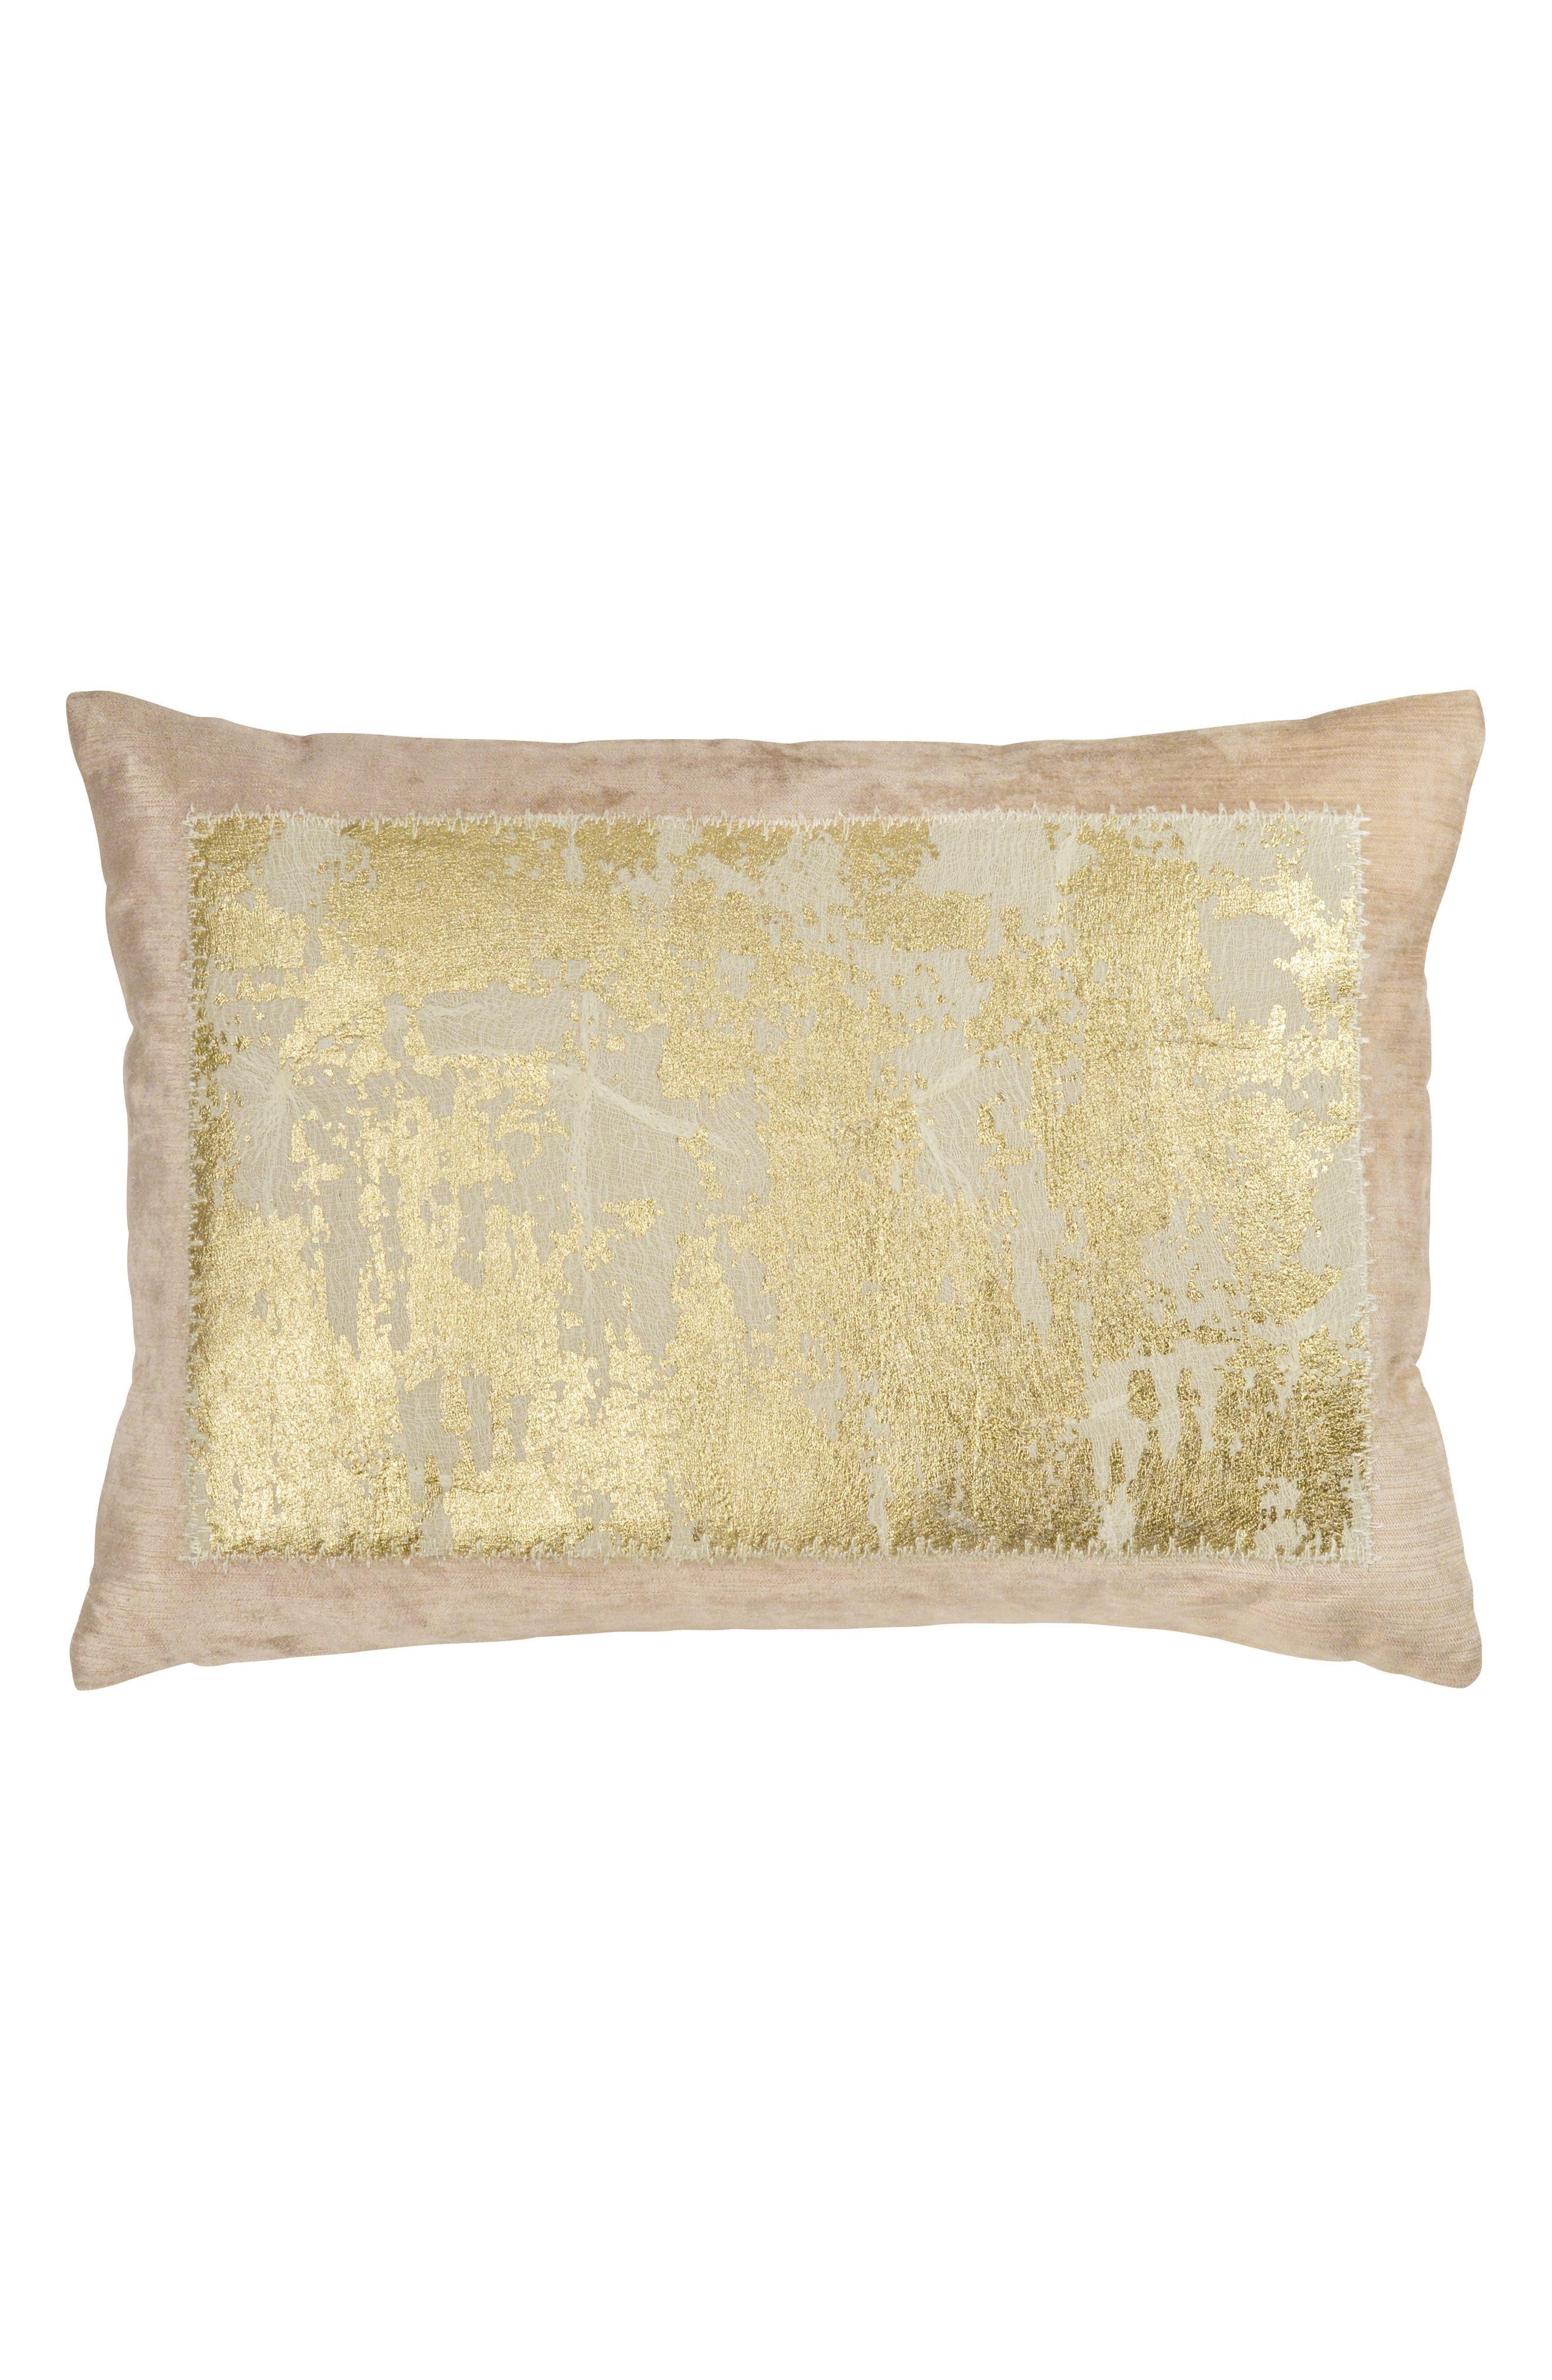 Distressed Metallic Accent Pillow,                             Main thumbnail 1, color,                             BLUSH